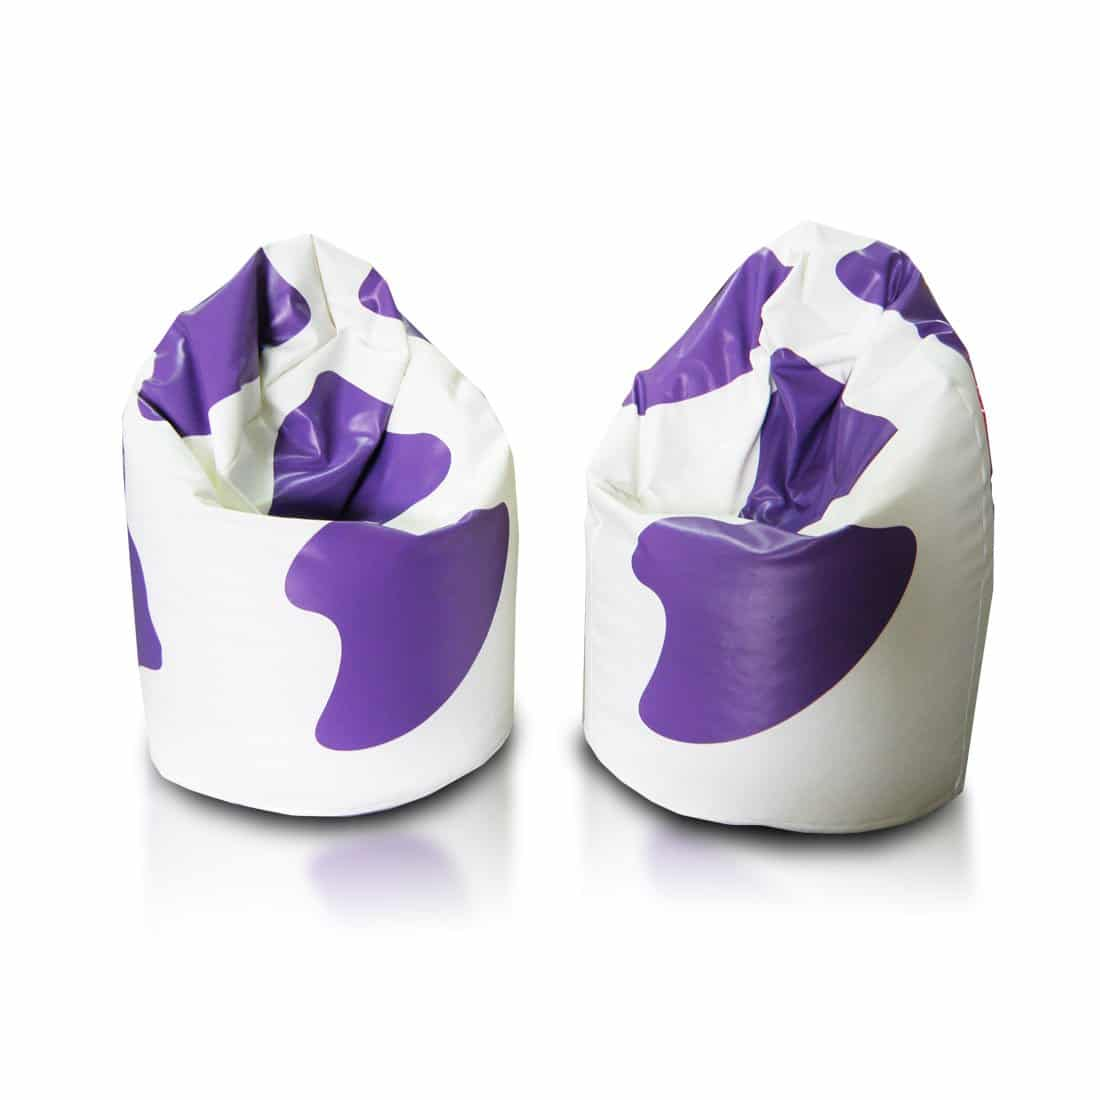 fotolii puf personalizate logo brand beanbags promotionale 19